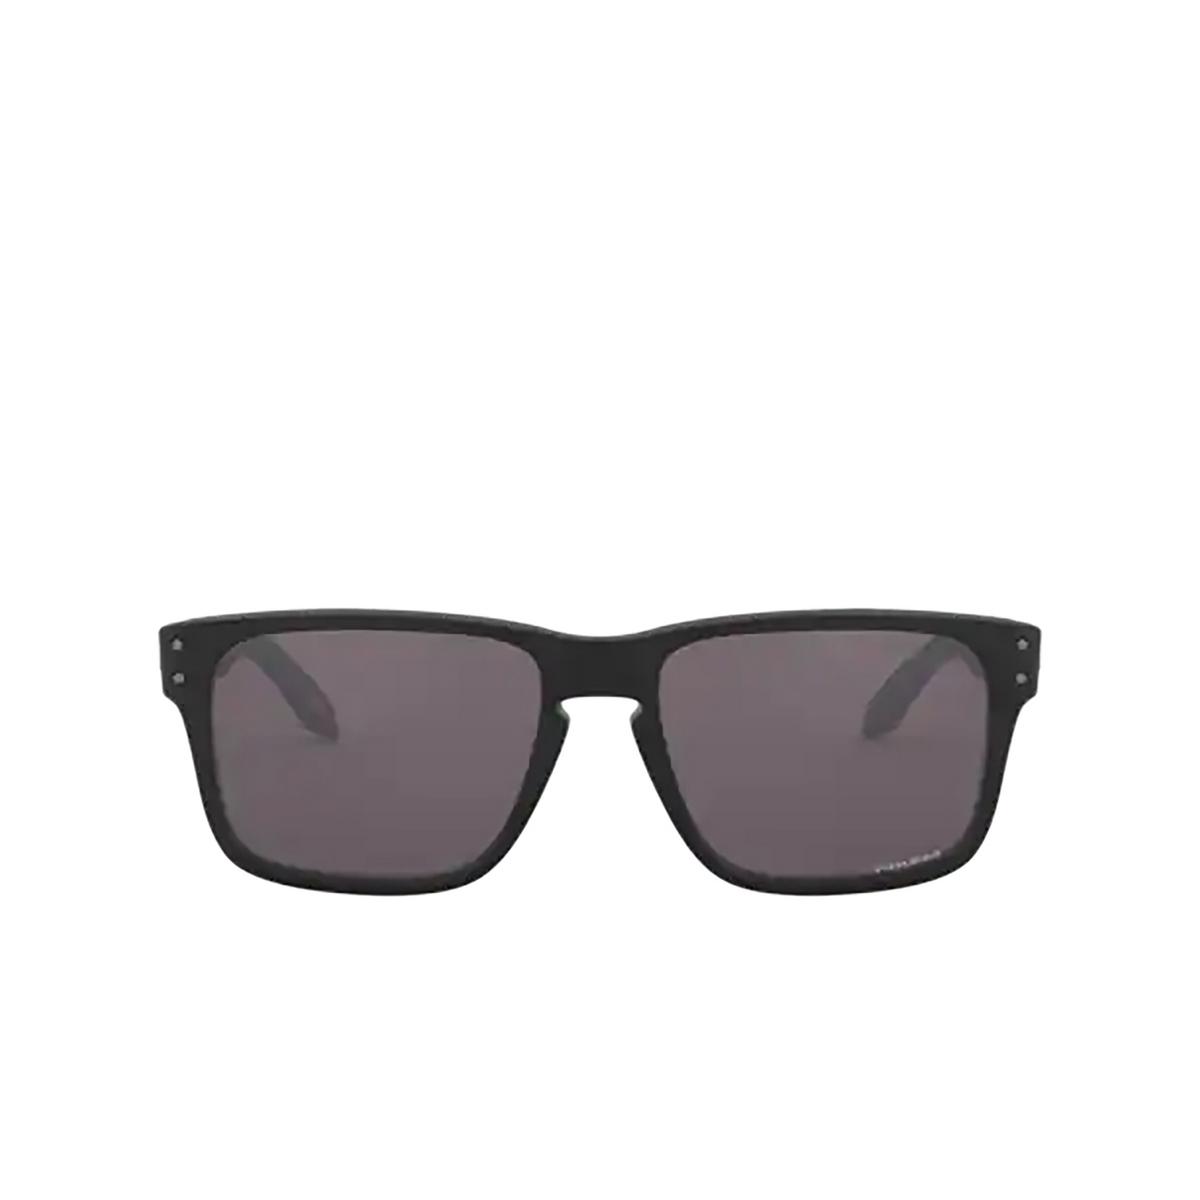 Oakley® Square Sunglasses: Holbrook Xs OJ9007 color Matte Black 900709 - front view.